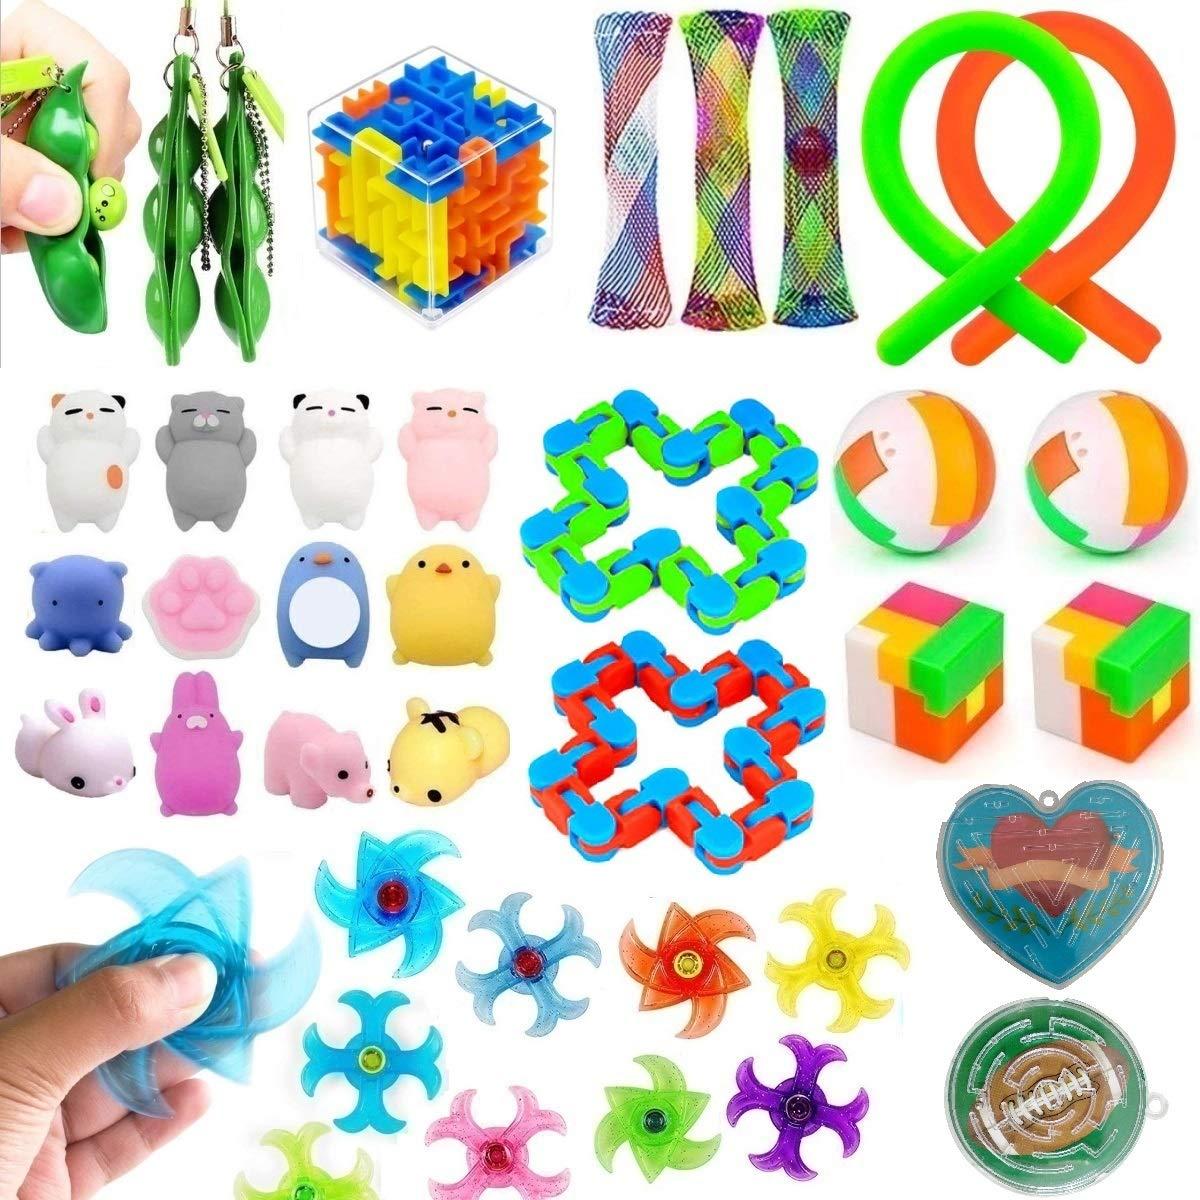 Sensory Figet Toys Adhd Autism Special Occupational Thra uDSJUKL czKIL